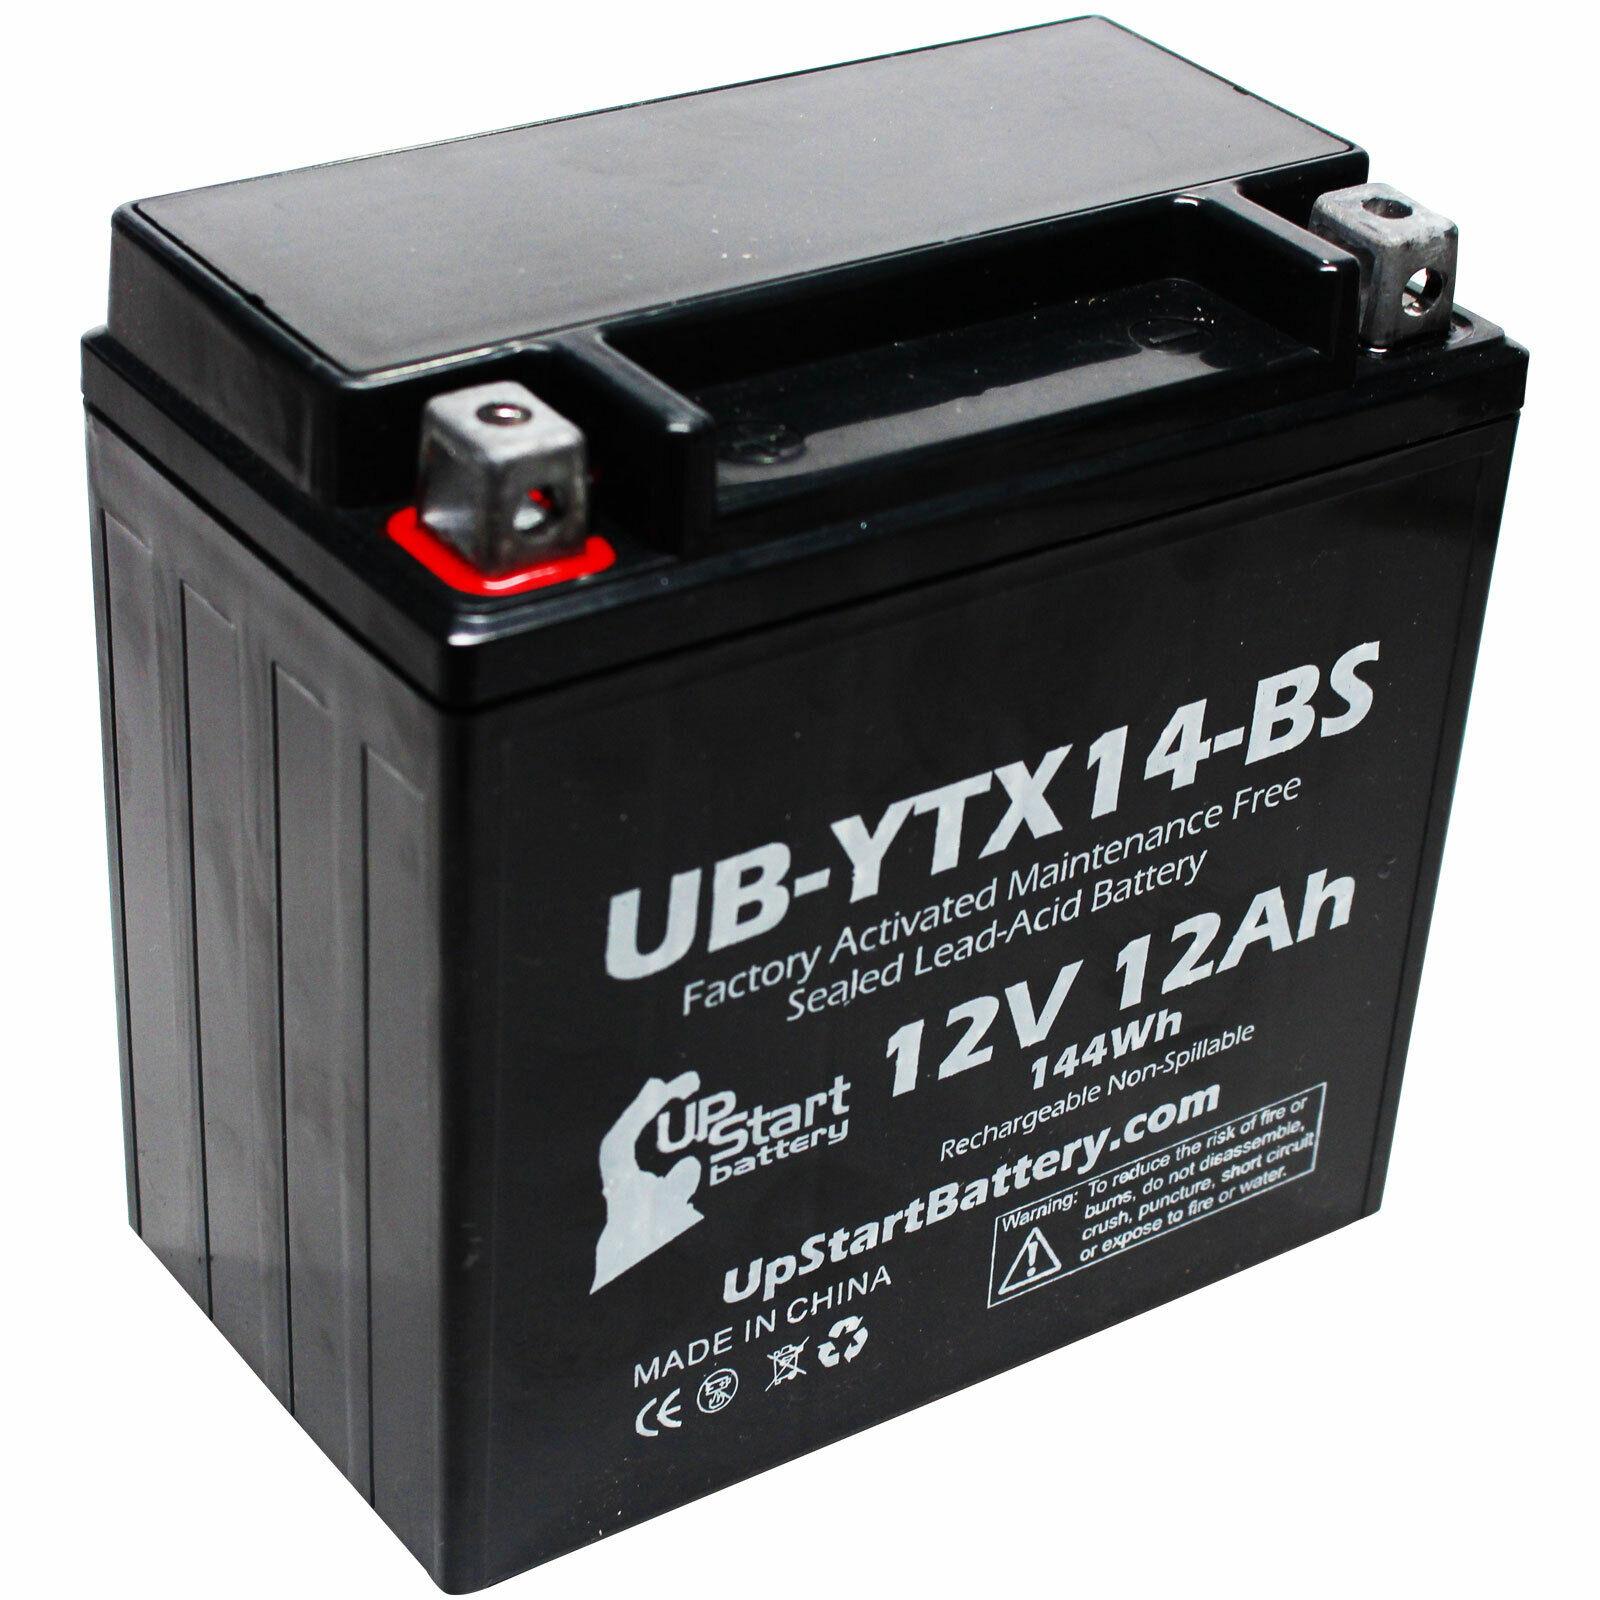 12V 12AH Battery for 2000 Honda TRX400FW Foreman 400 CC